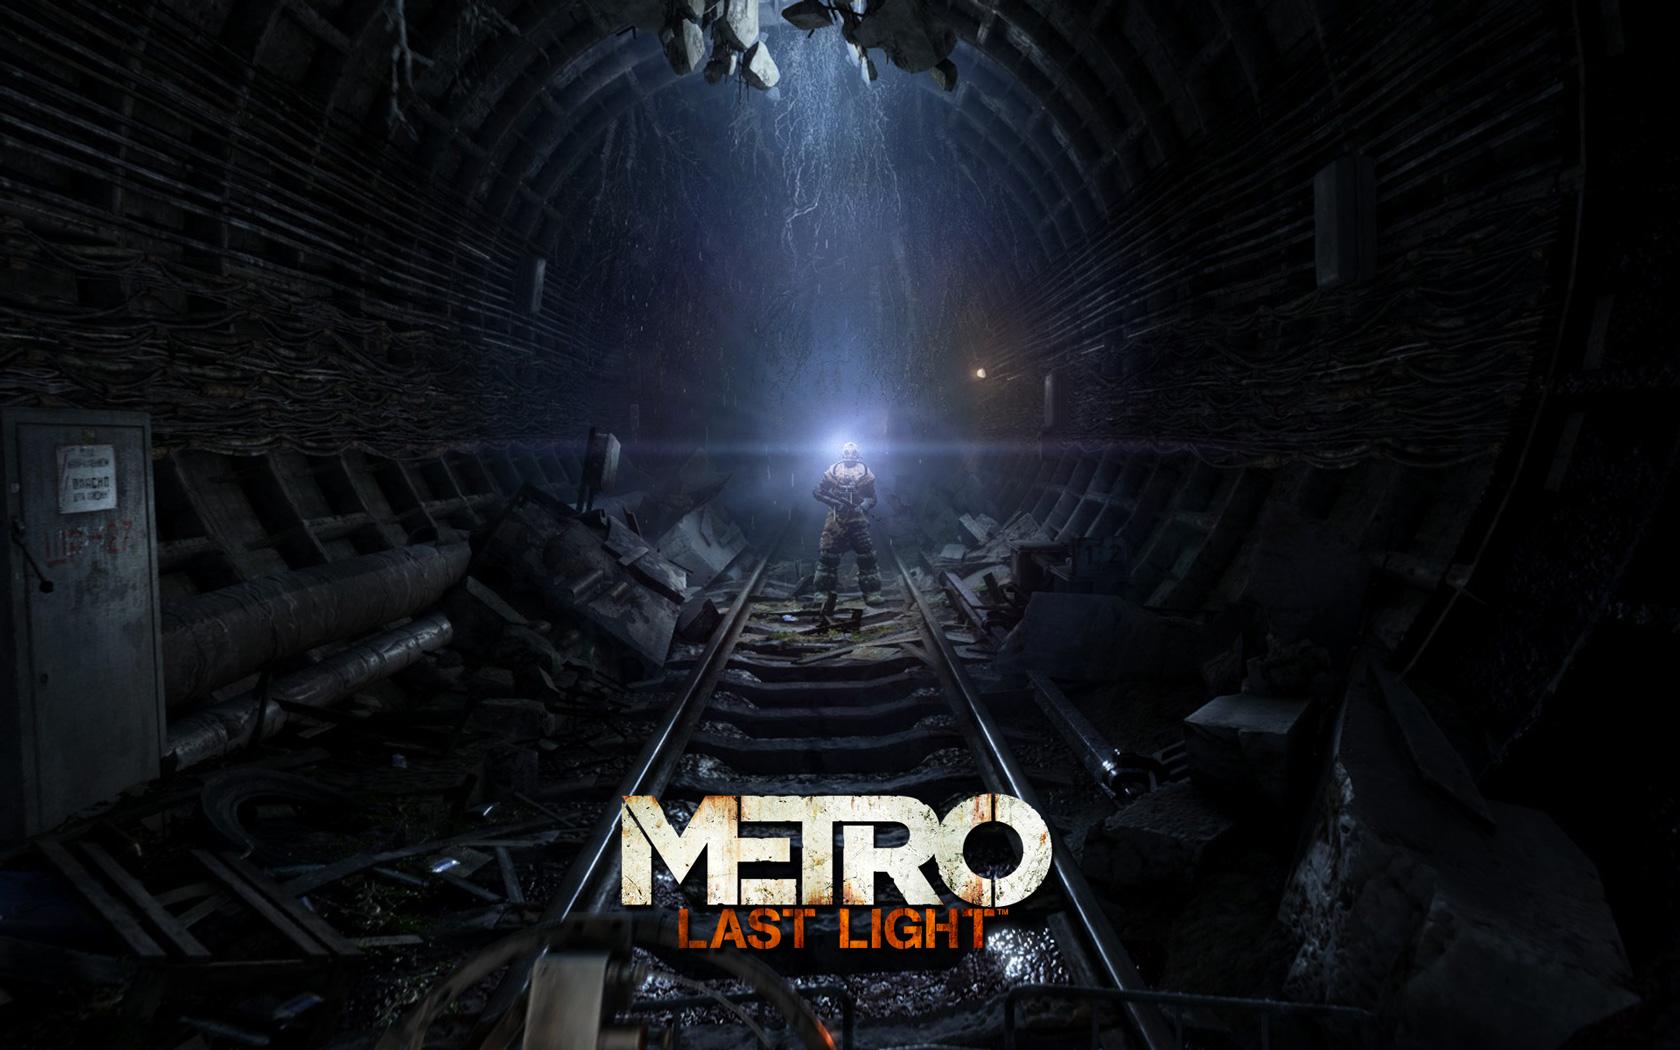 Free Metro: Last Light Wallpaper in 1680x1050